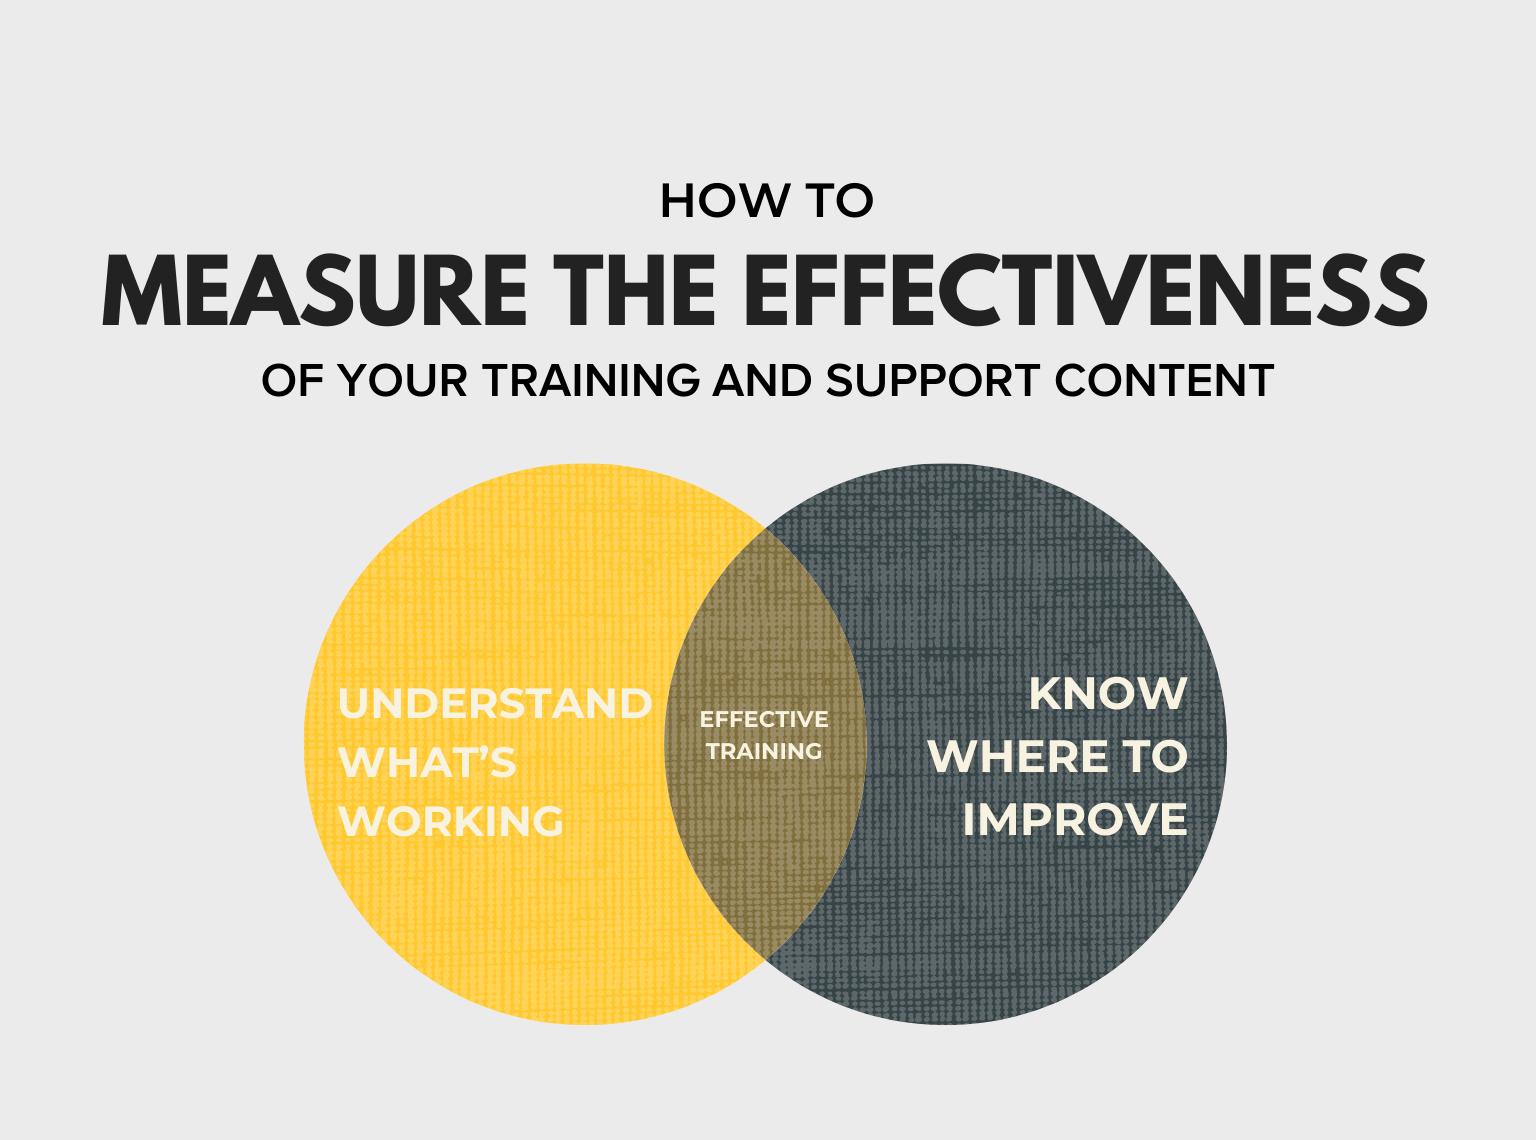 measure training effectiveness